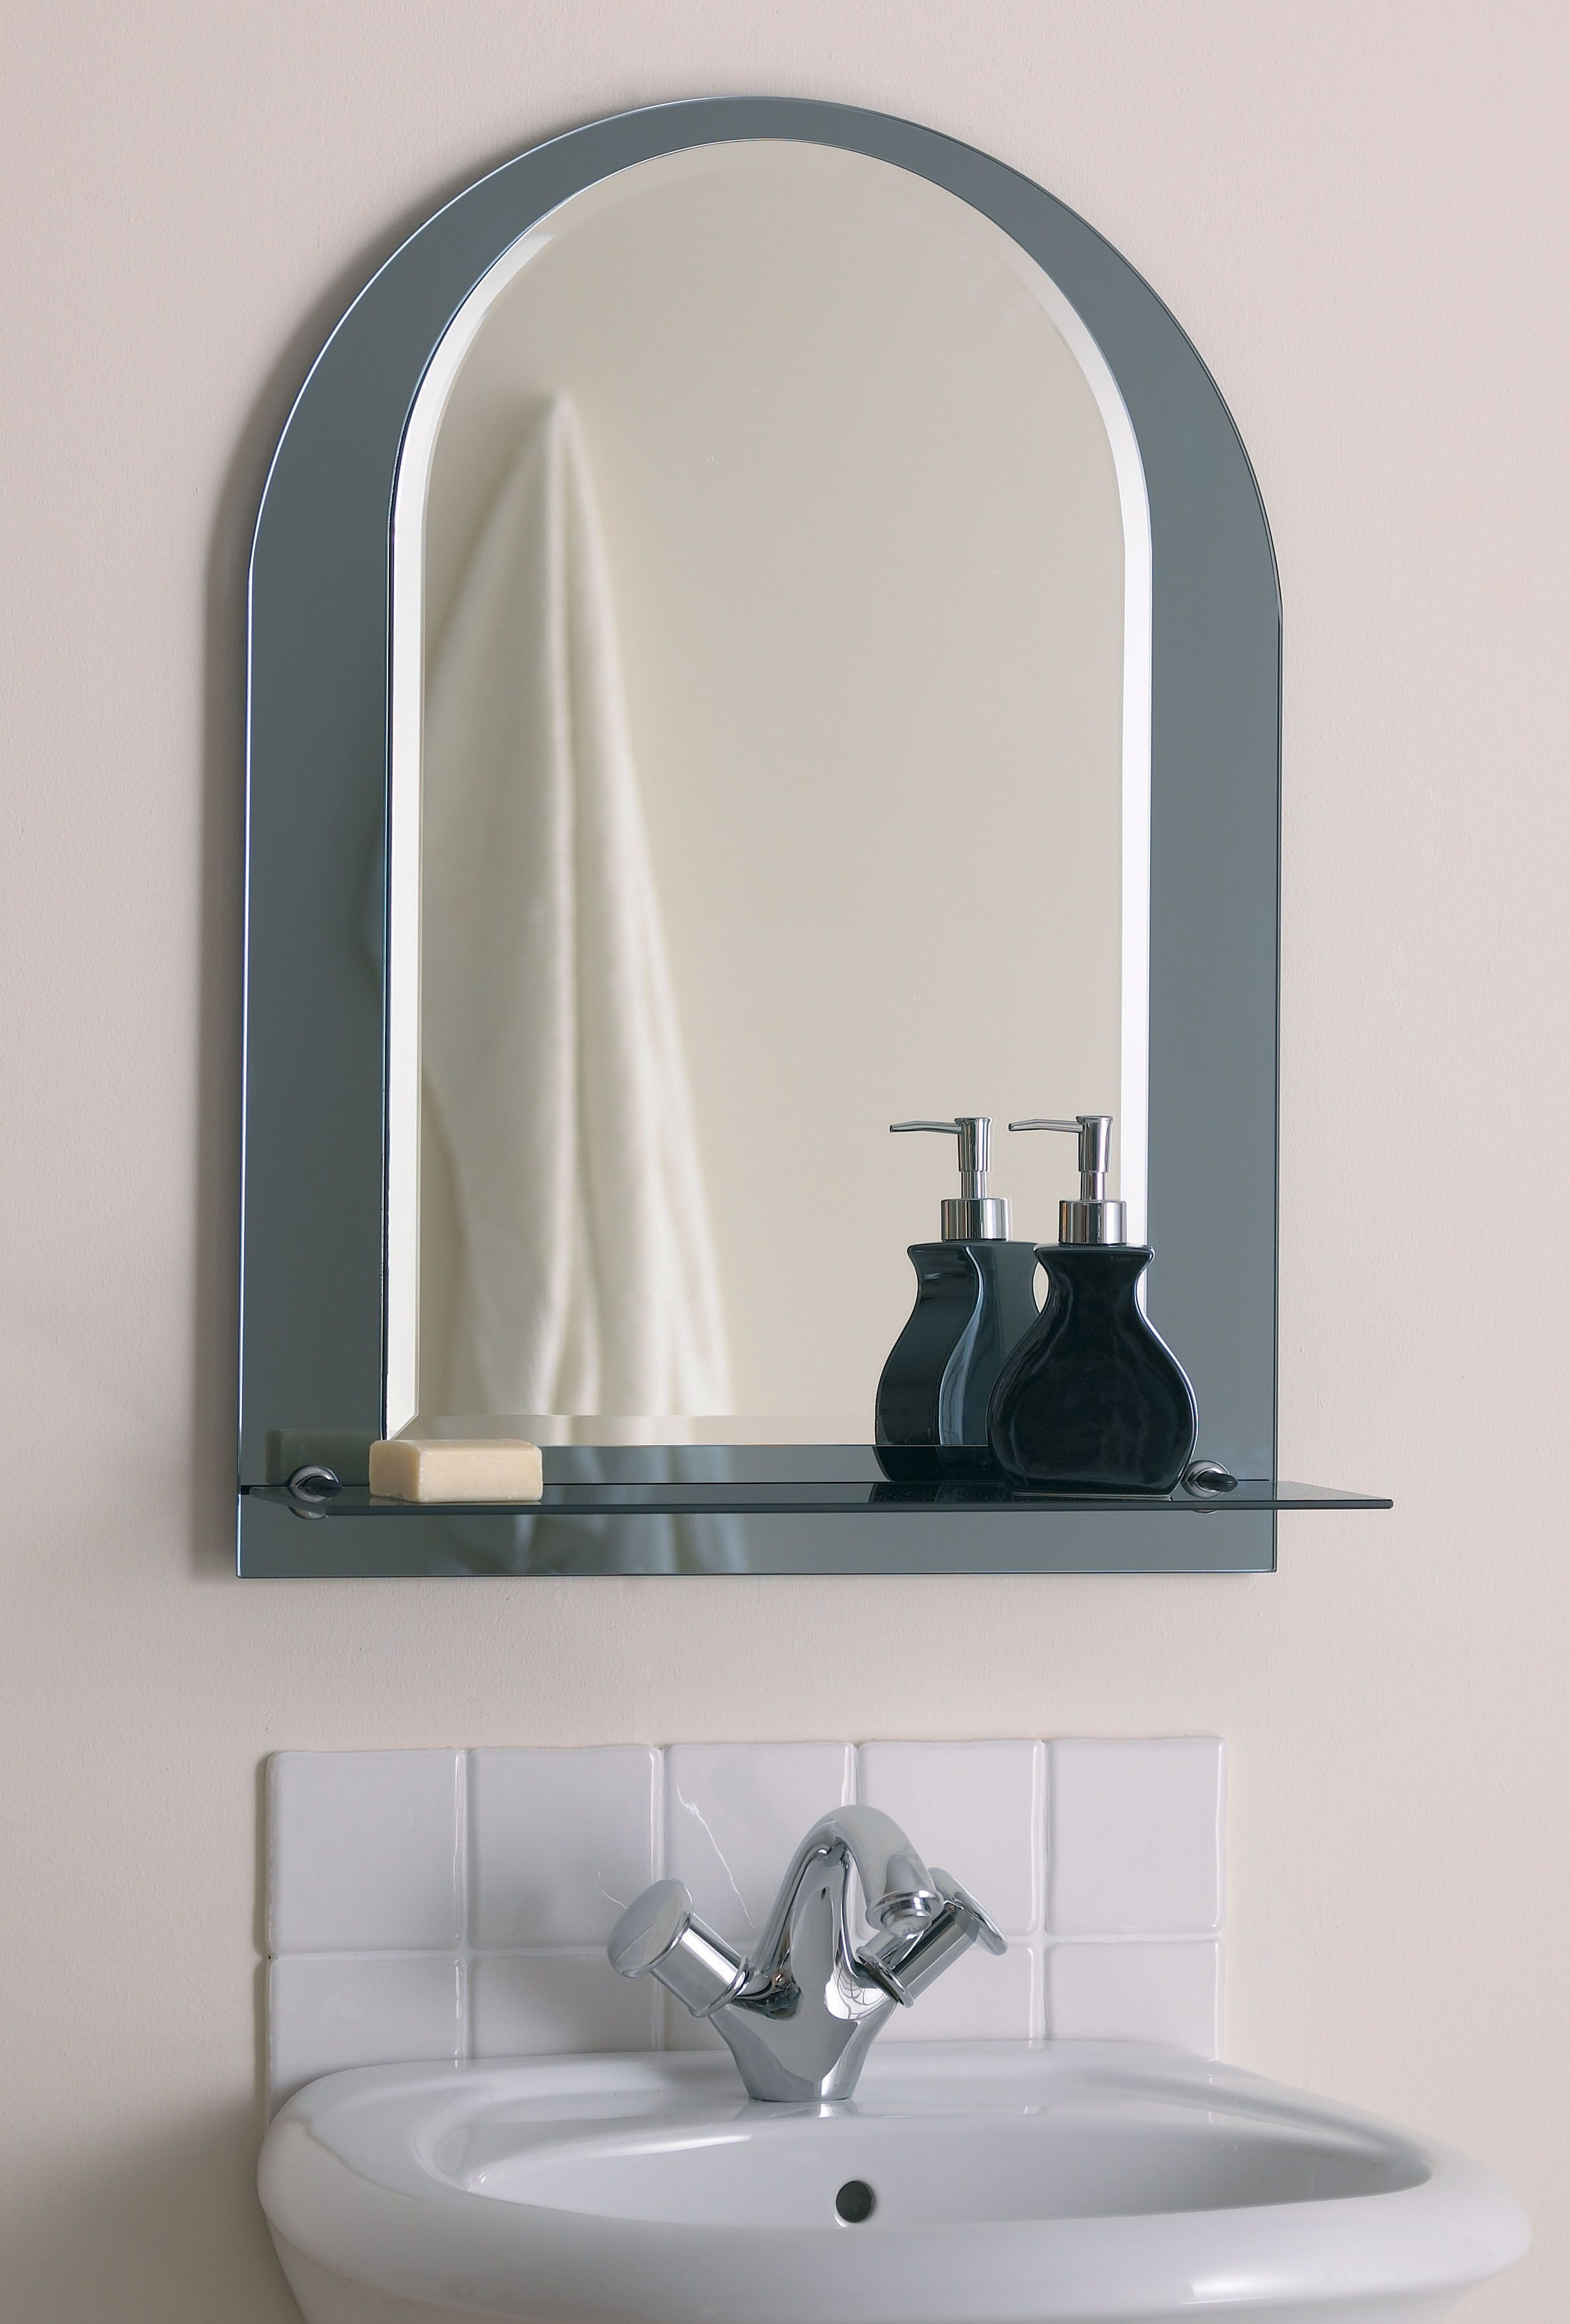 Bathroom Narrow Bathroom Mirror Just Simple But Modern Decorative - Narrow bathroom mirror